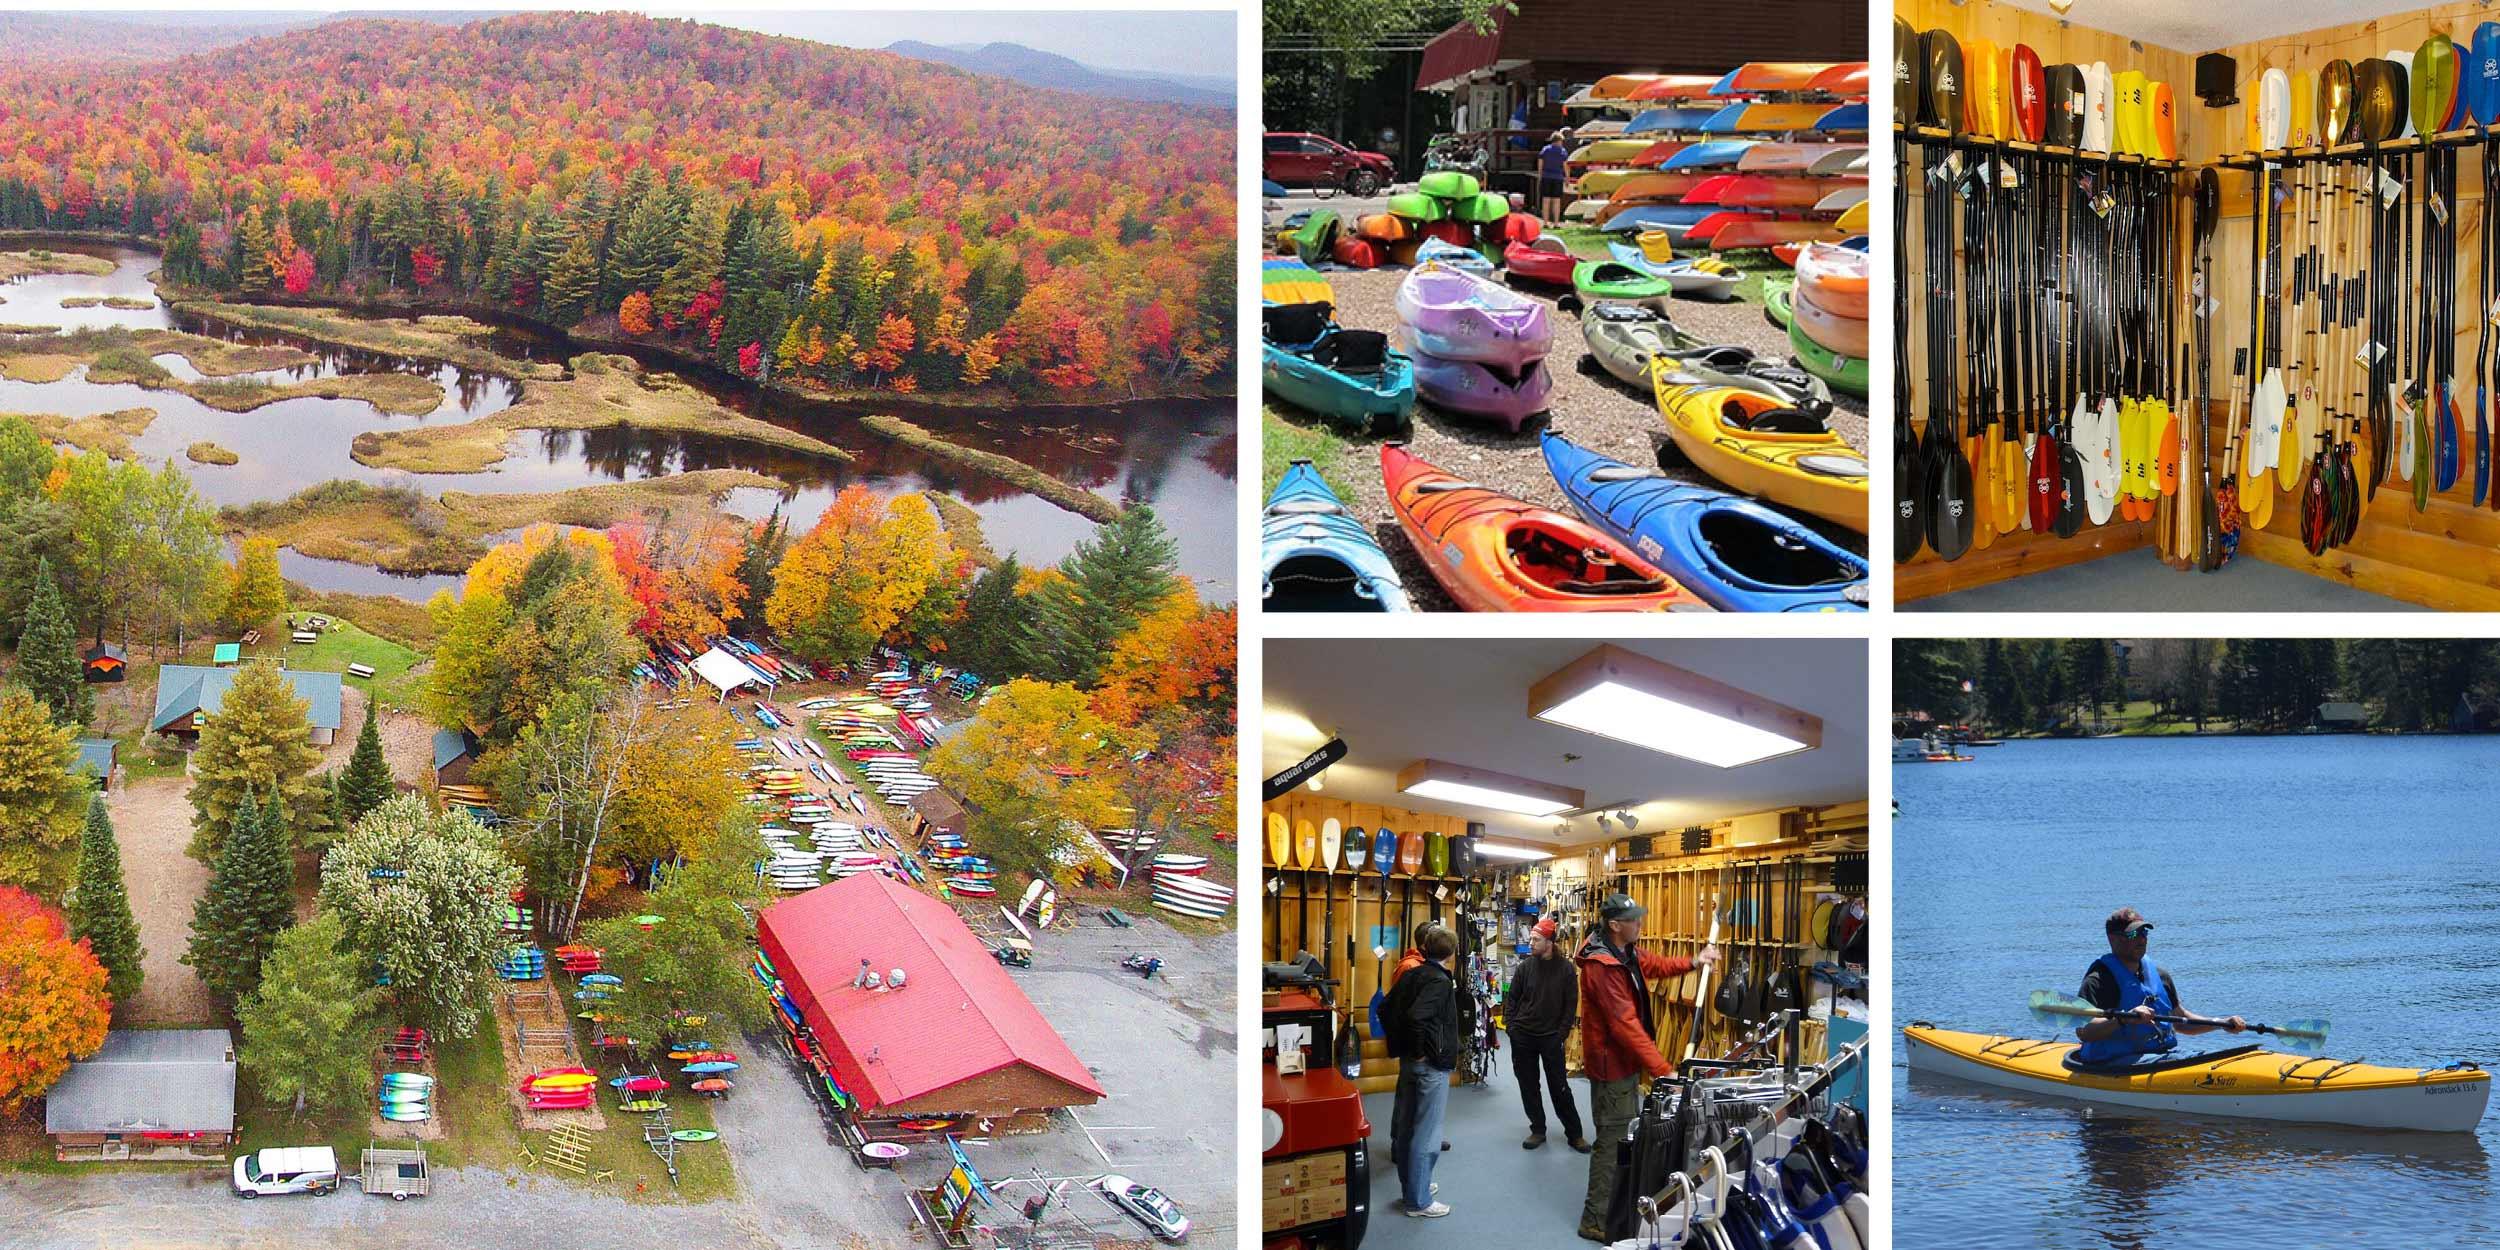 Various photos of Paddlesports shops